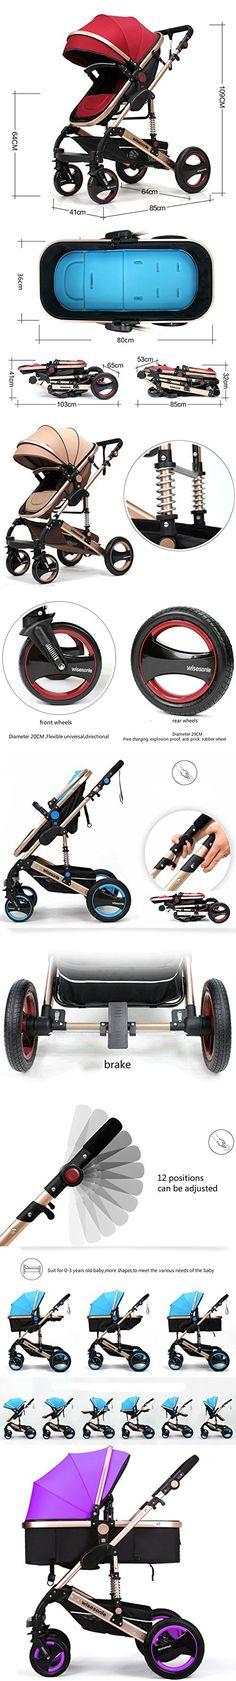 Luxury Newborn Baby Strollers Travel Systems Carriage Toddler Infant Stroller Pushchair Pram Foldable Anti-shock (Purple)